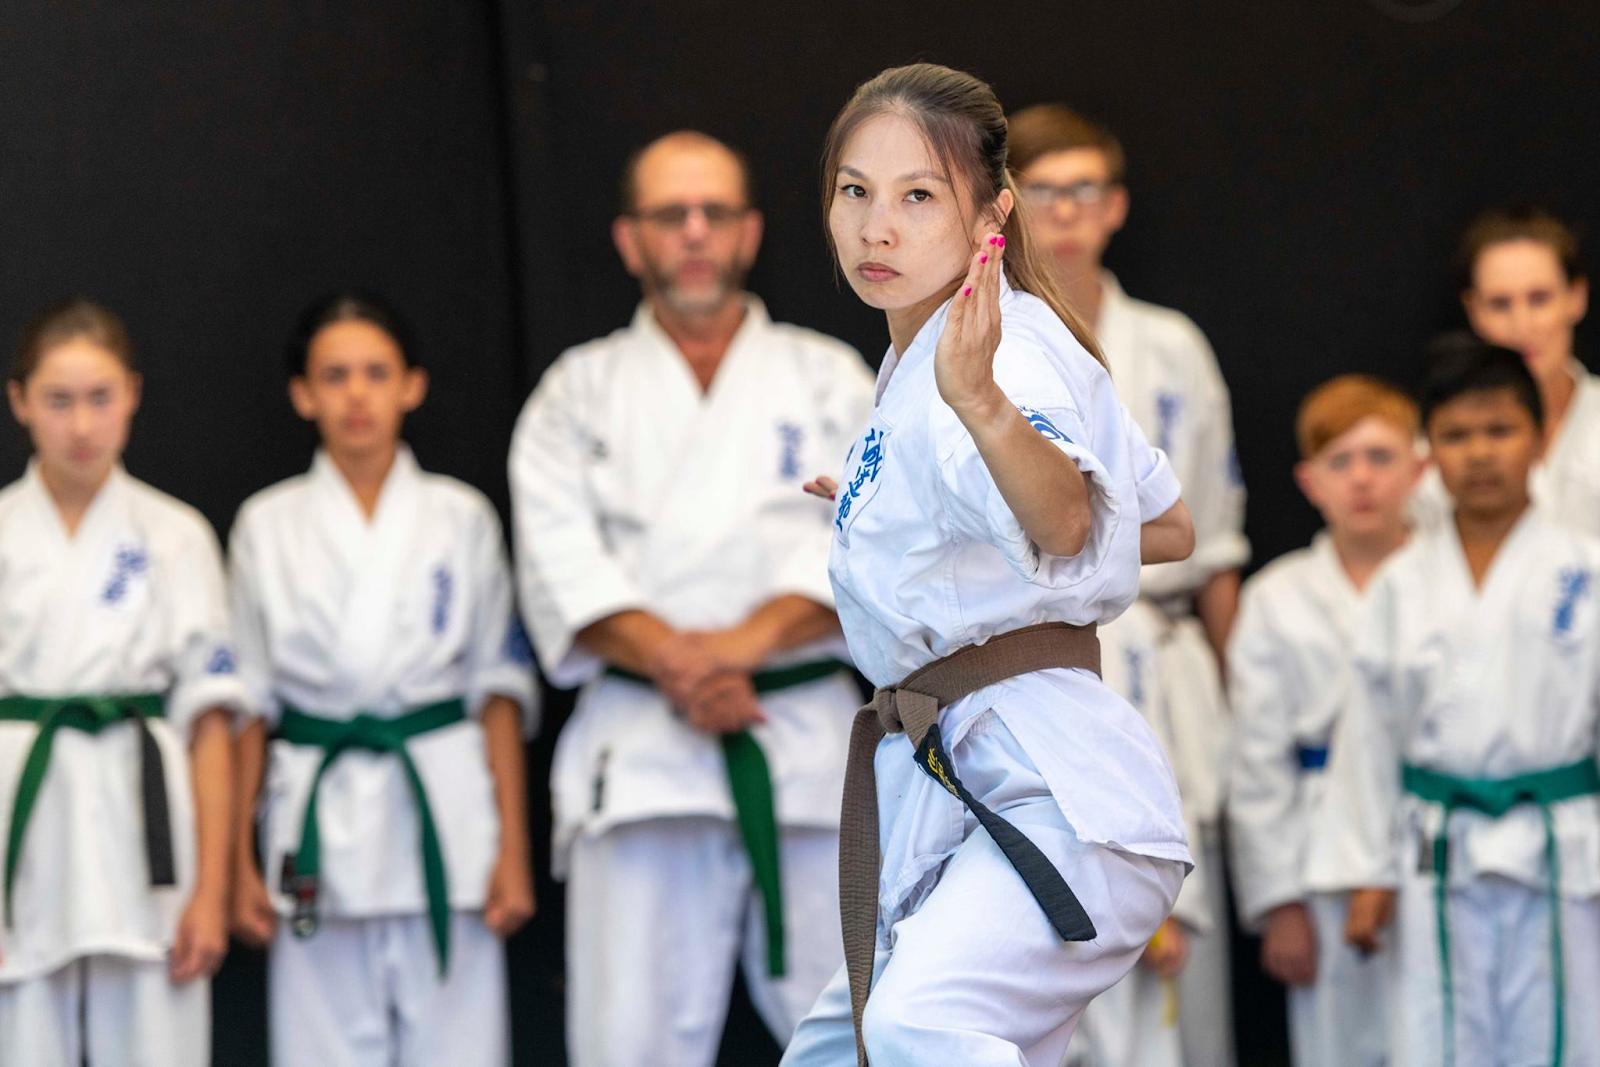 Vivian doing karate at the Japan festival (photo credit Rob Stone Photography)